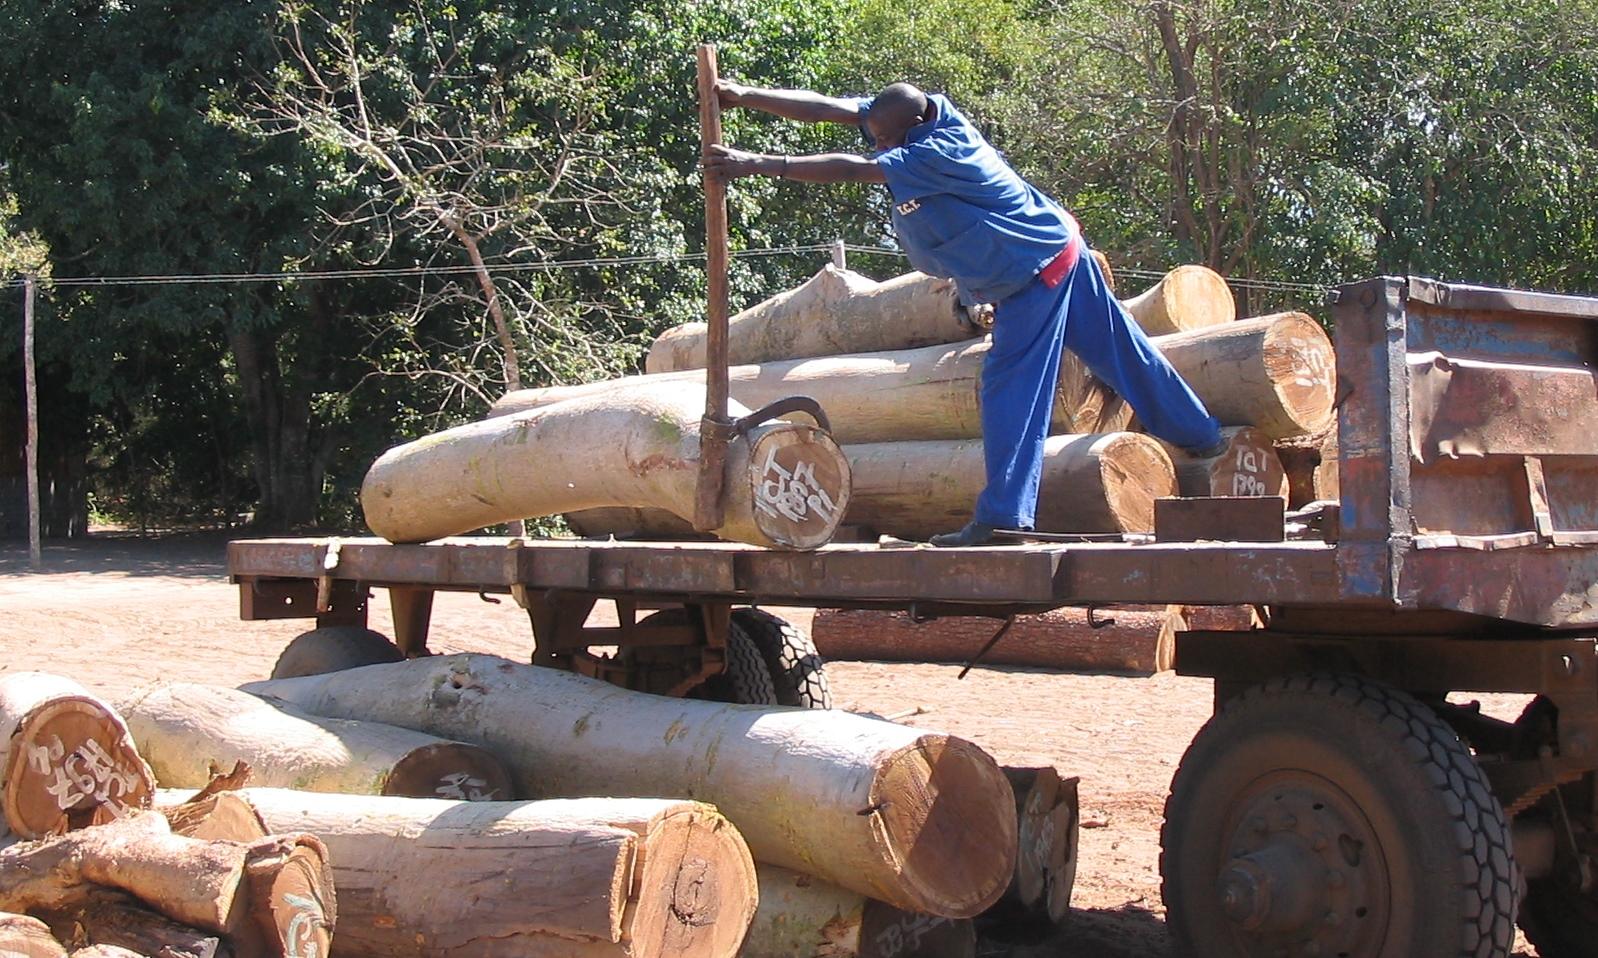 Offloading harvested timber